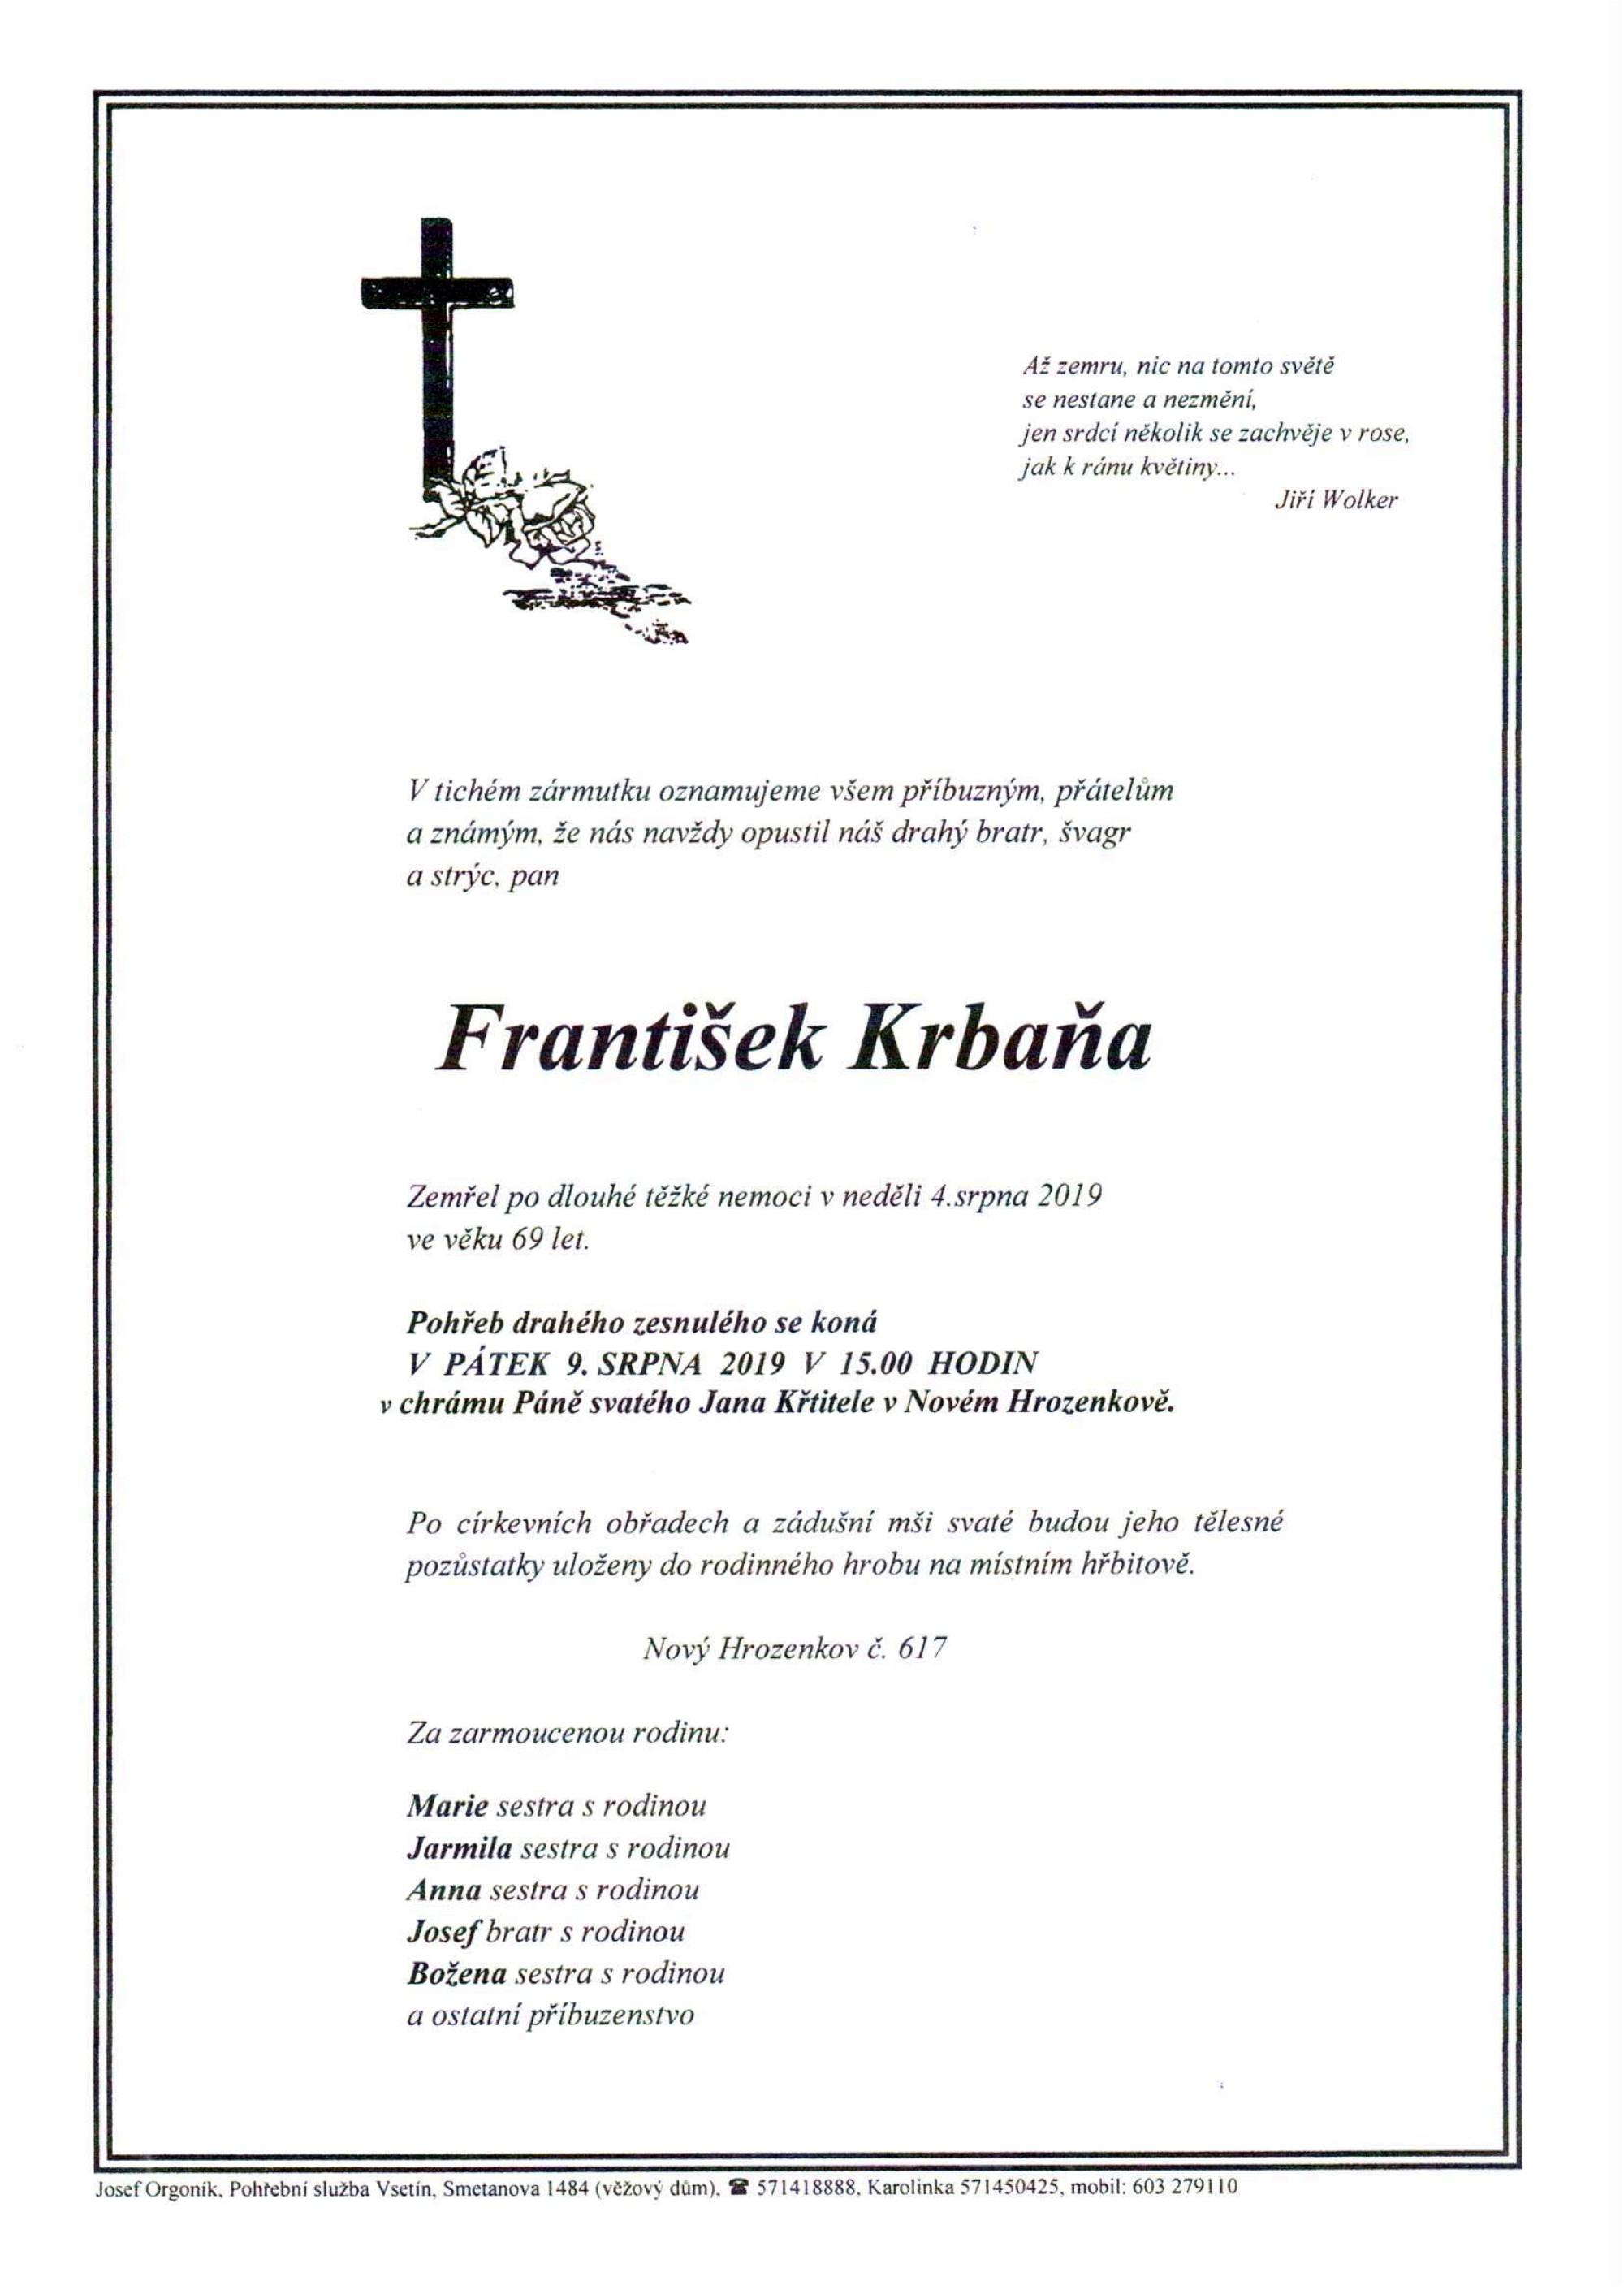 František Krbaňa